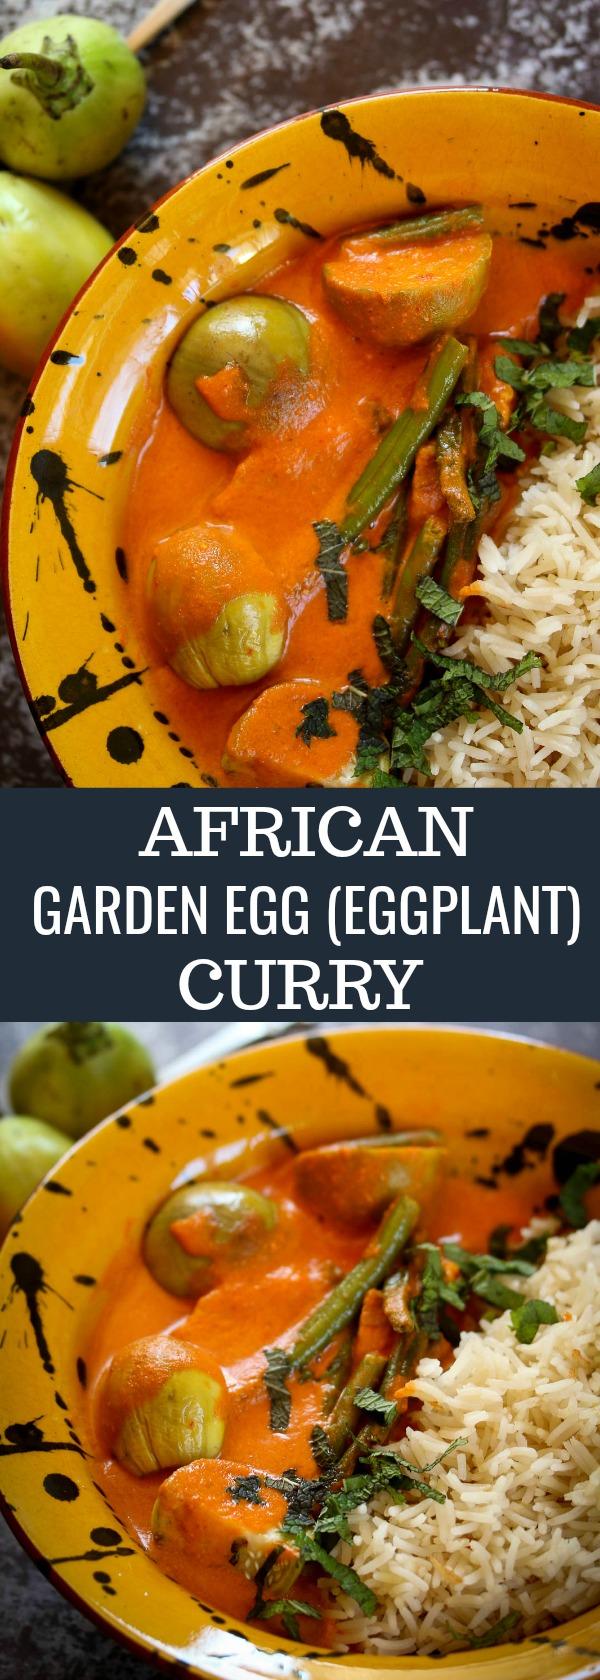 african-garden-egg-eggplant-curry